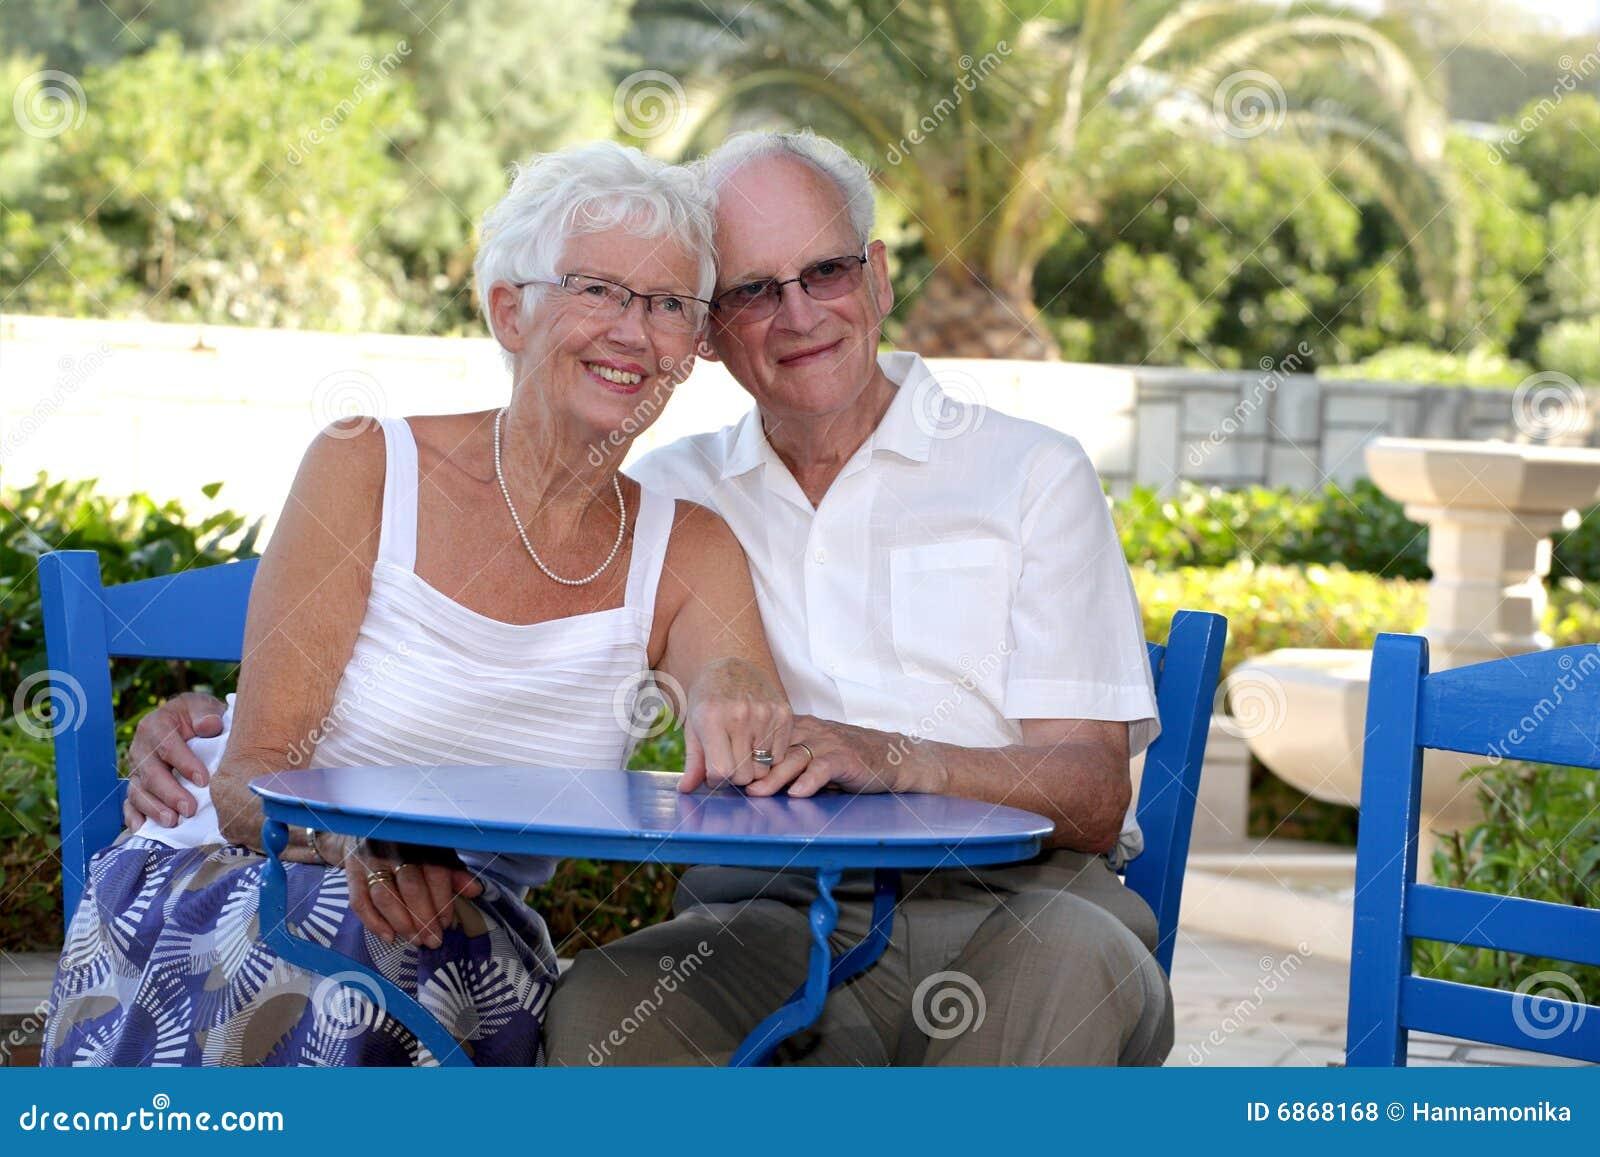 Beautiful couple senior